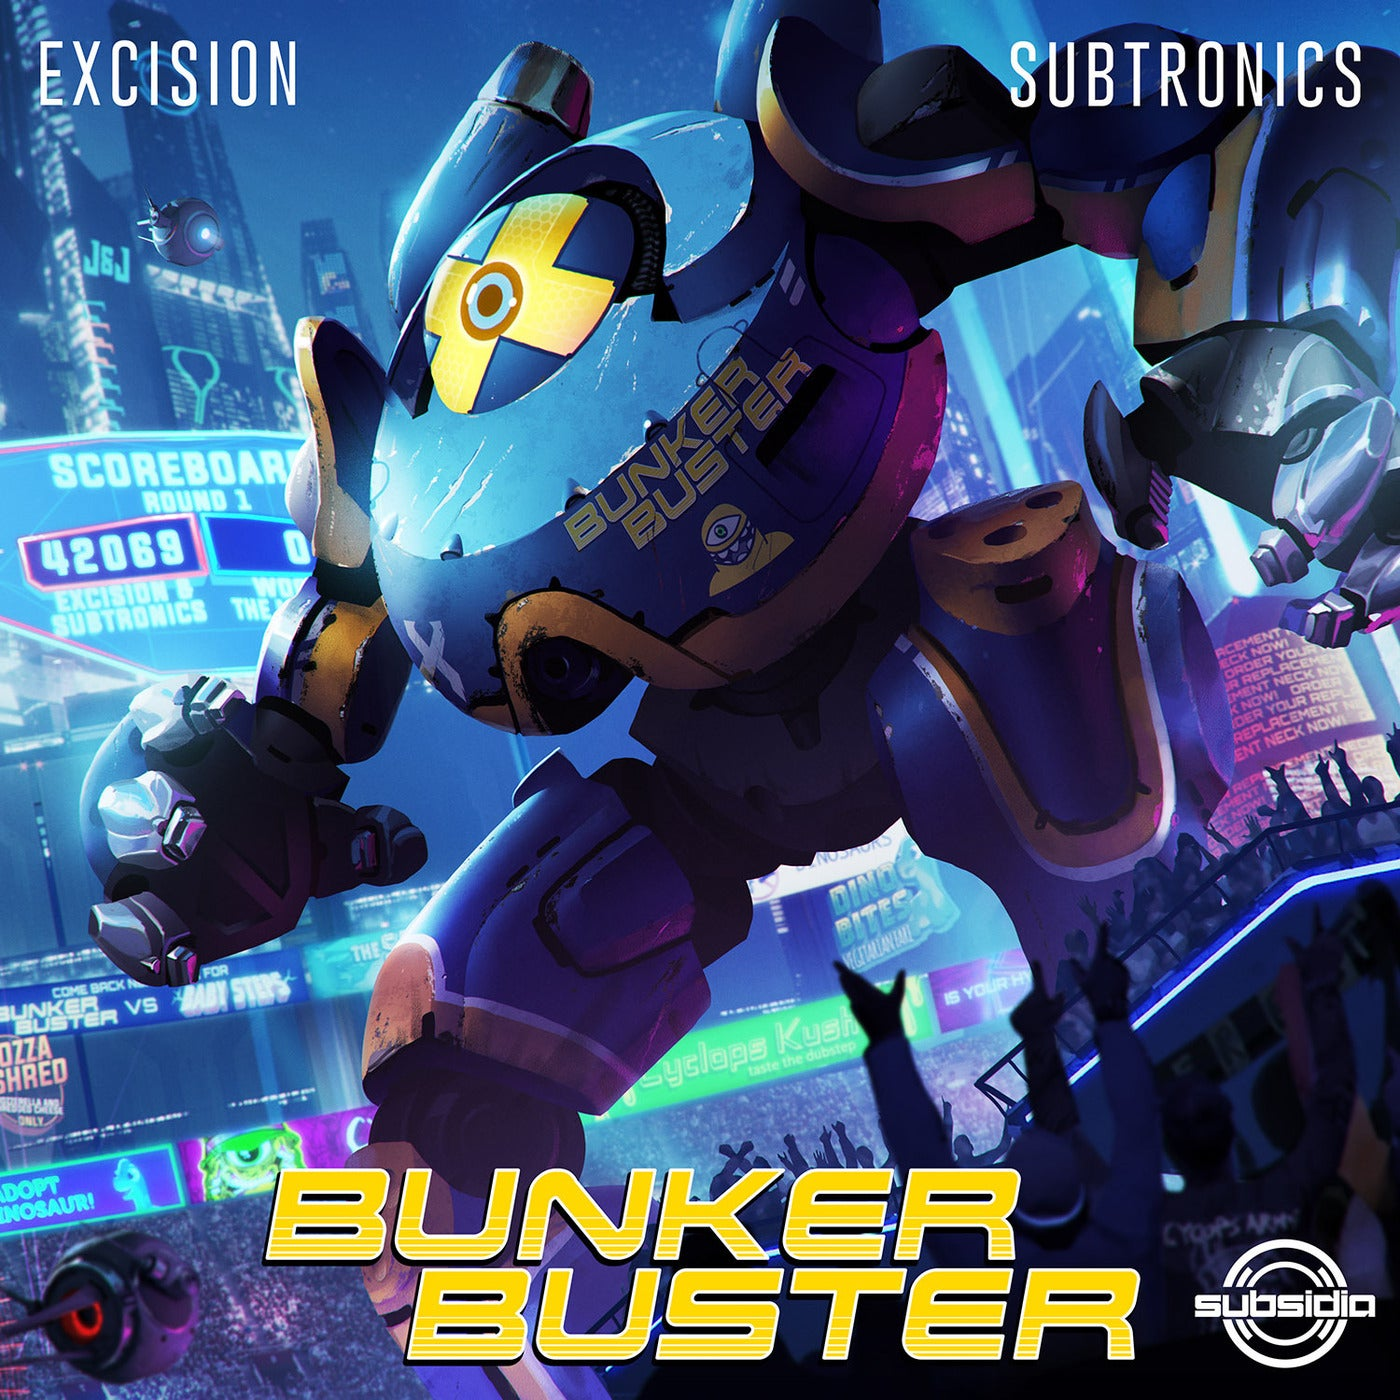 Bunker Buster (Original Mix)